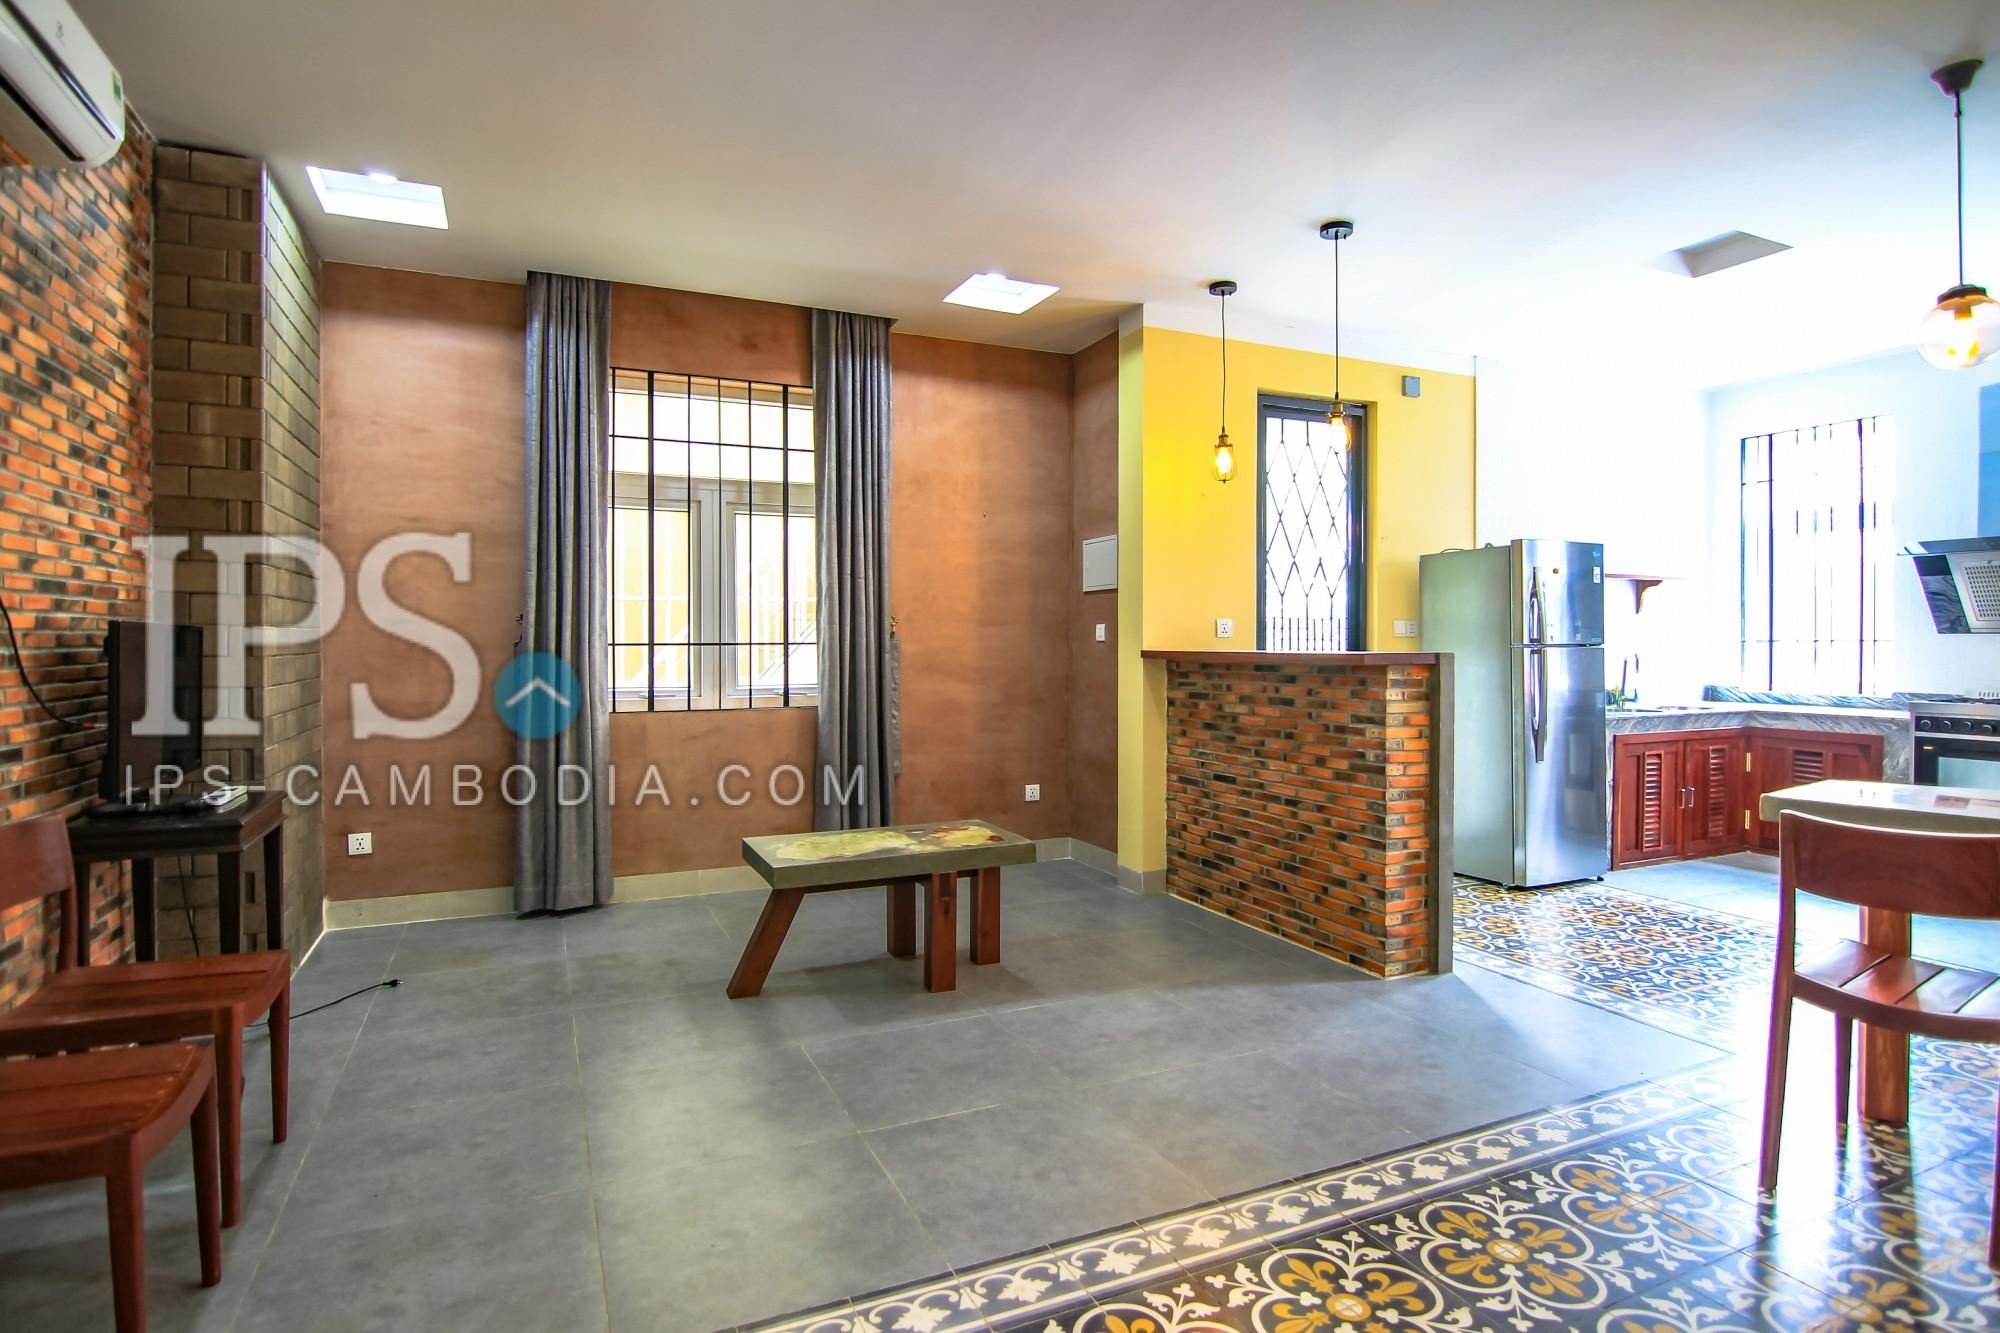 2 Bedrooms Apartment For Rent - Tonle Bassac